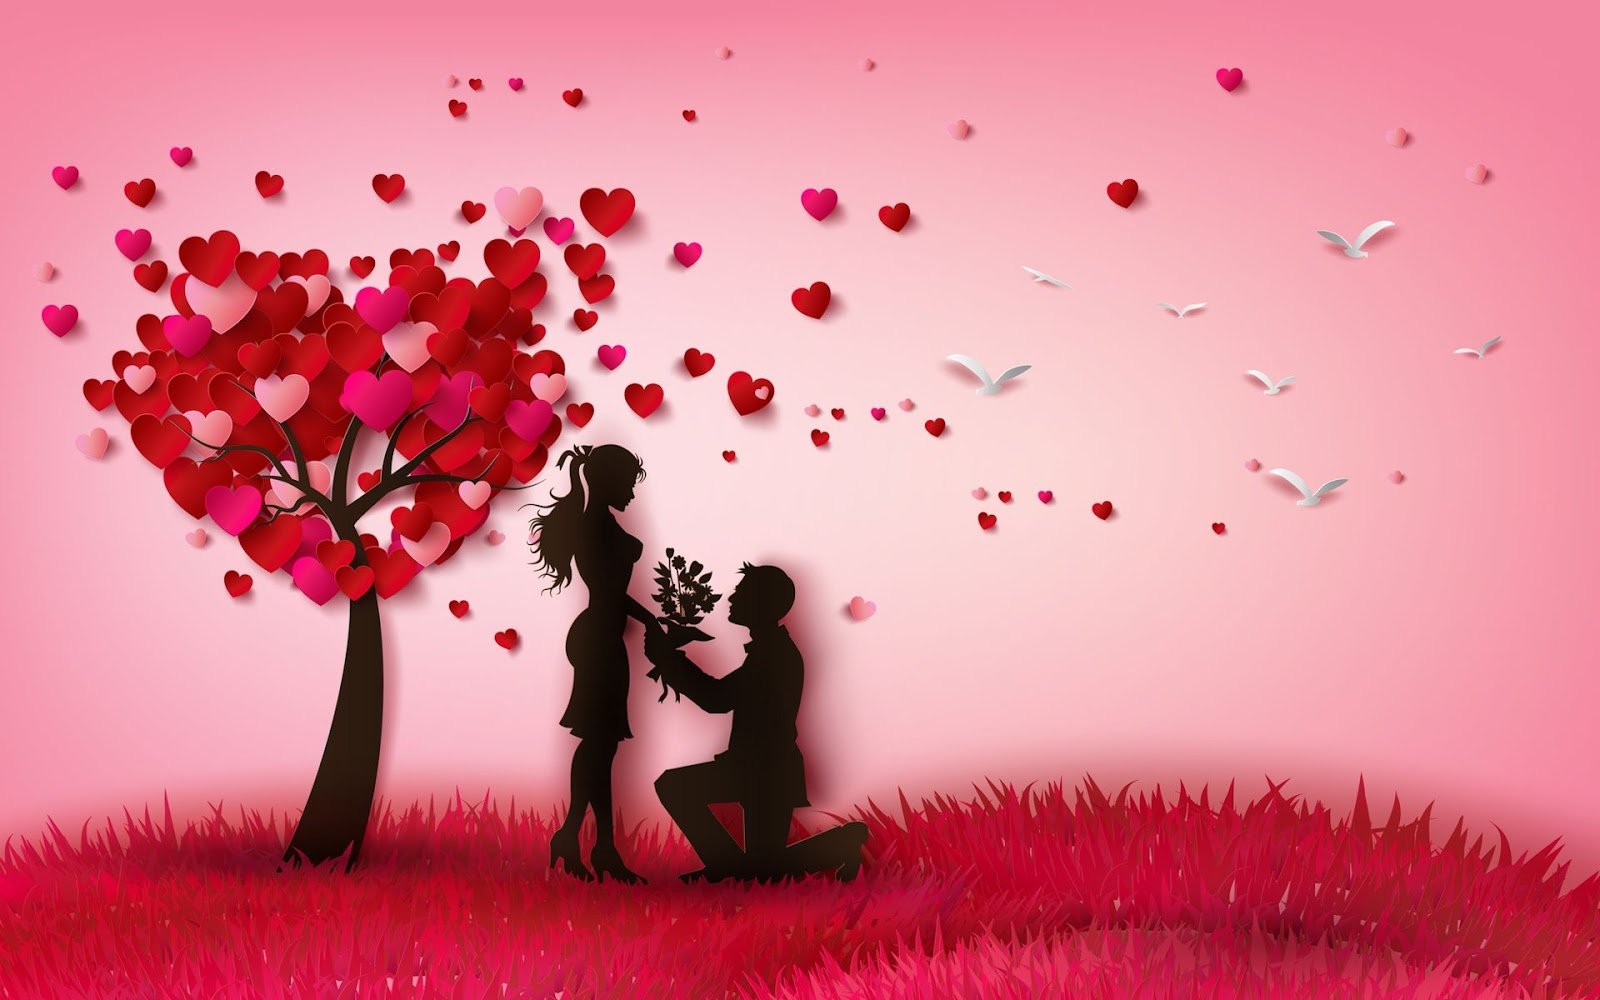 3d Couple Name Wallpaper Banco De Im 193 Genes Fondos Y Wallpapers Para Enchular Tu Pc